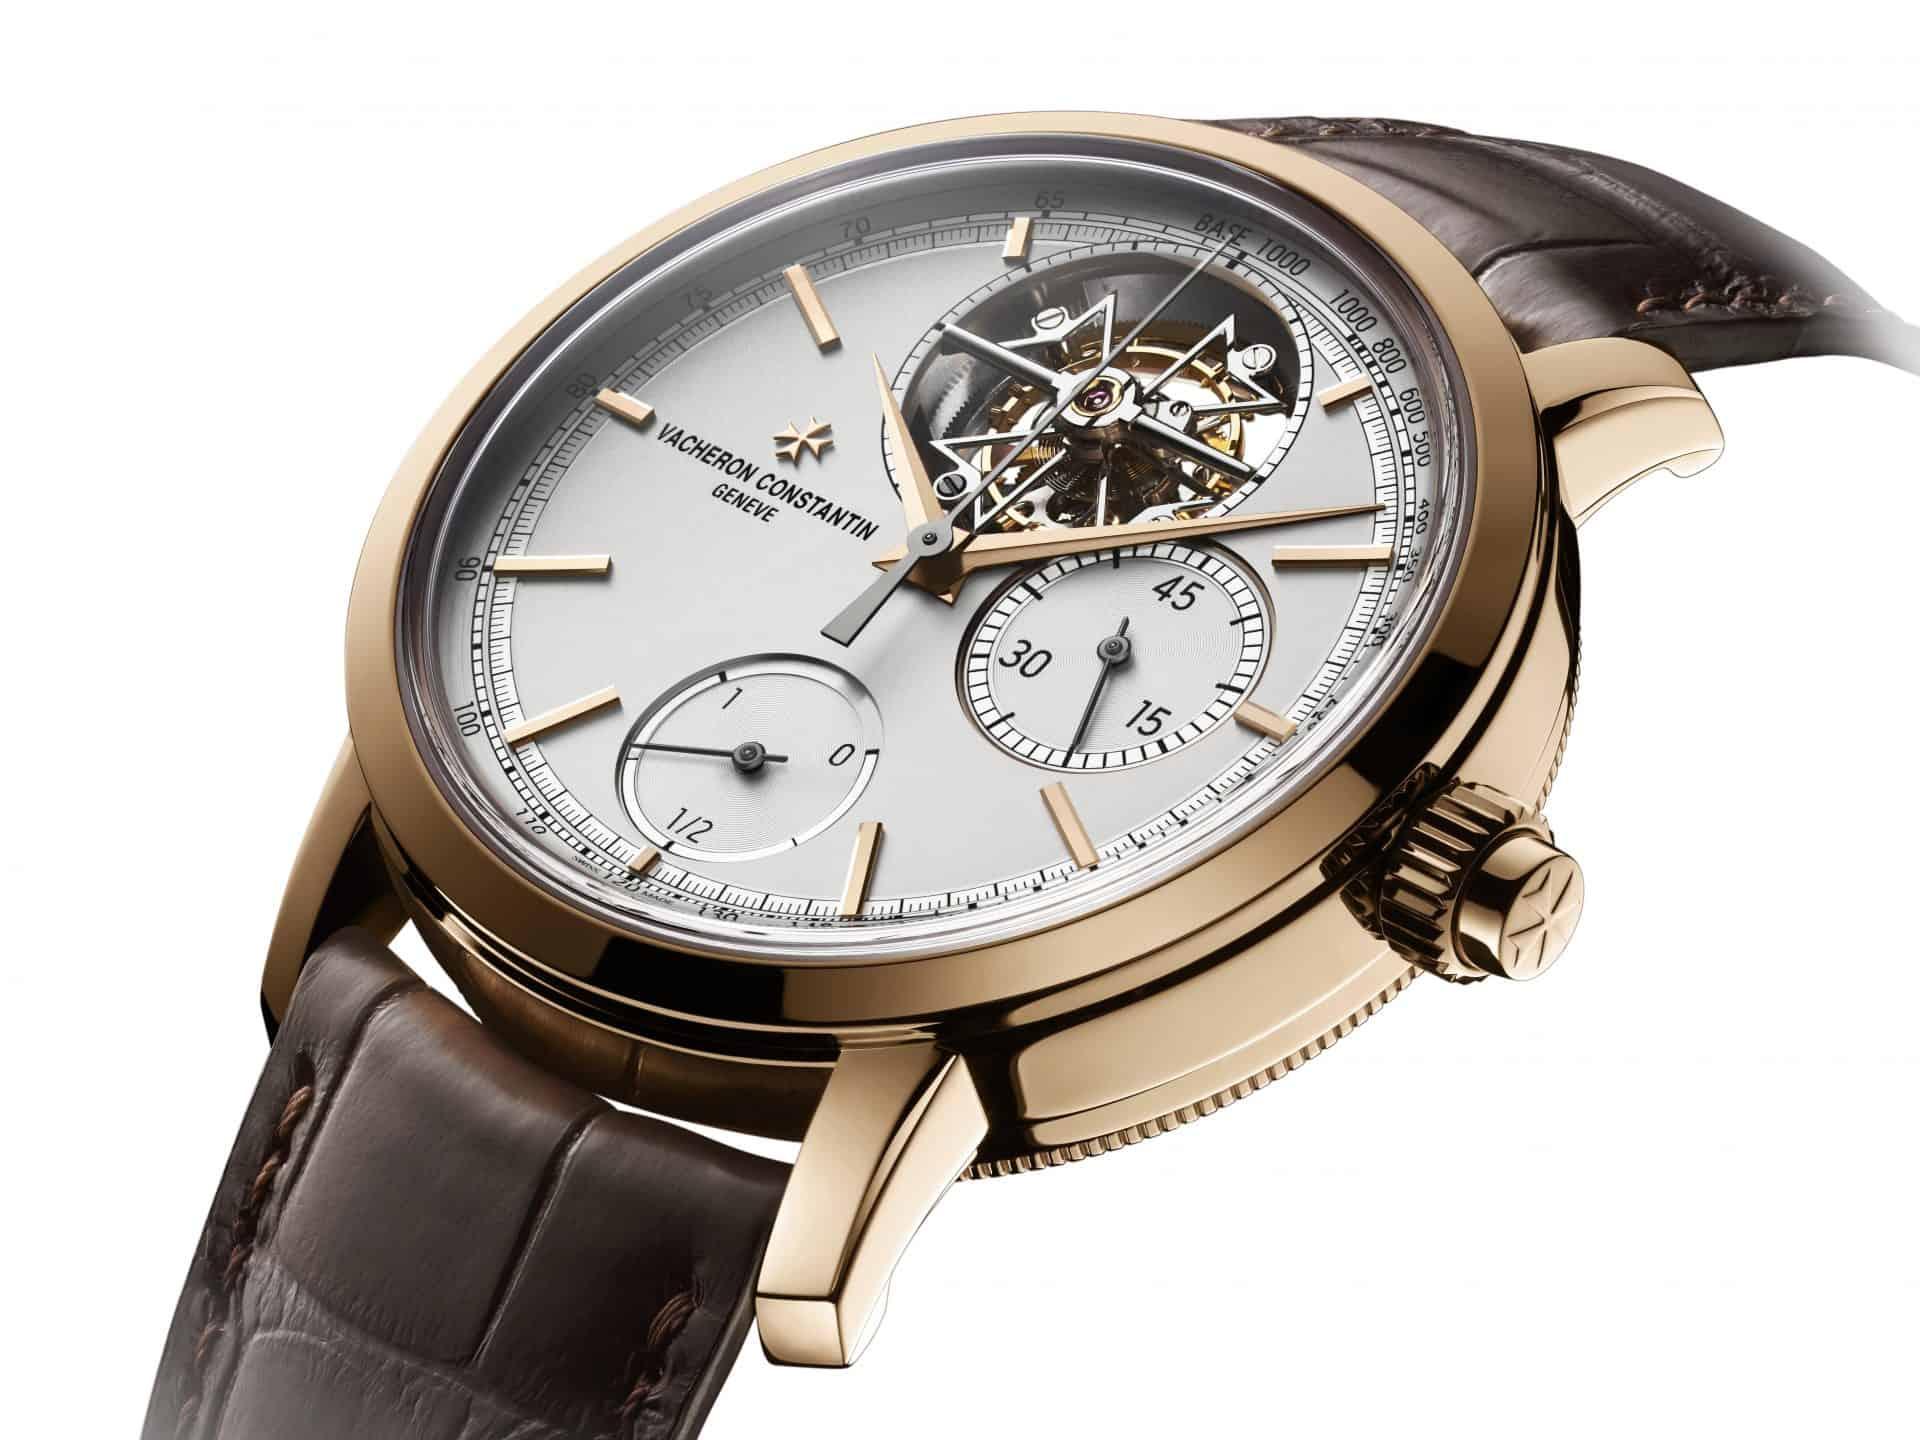 Der neue Vacheron Constantin Traditionelle Tourbillon Chronograph im Profil